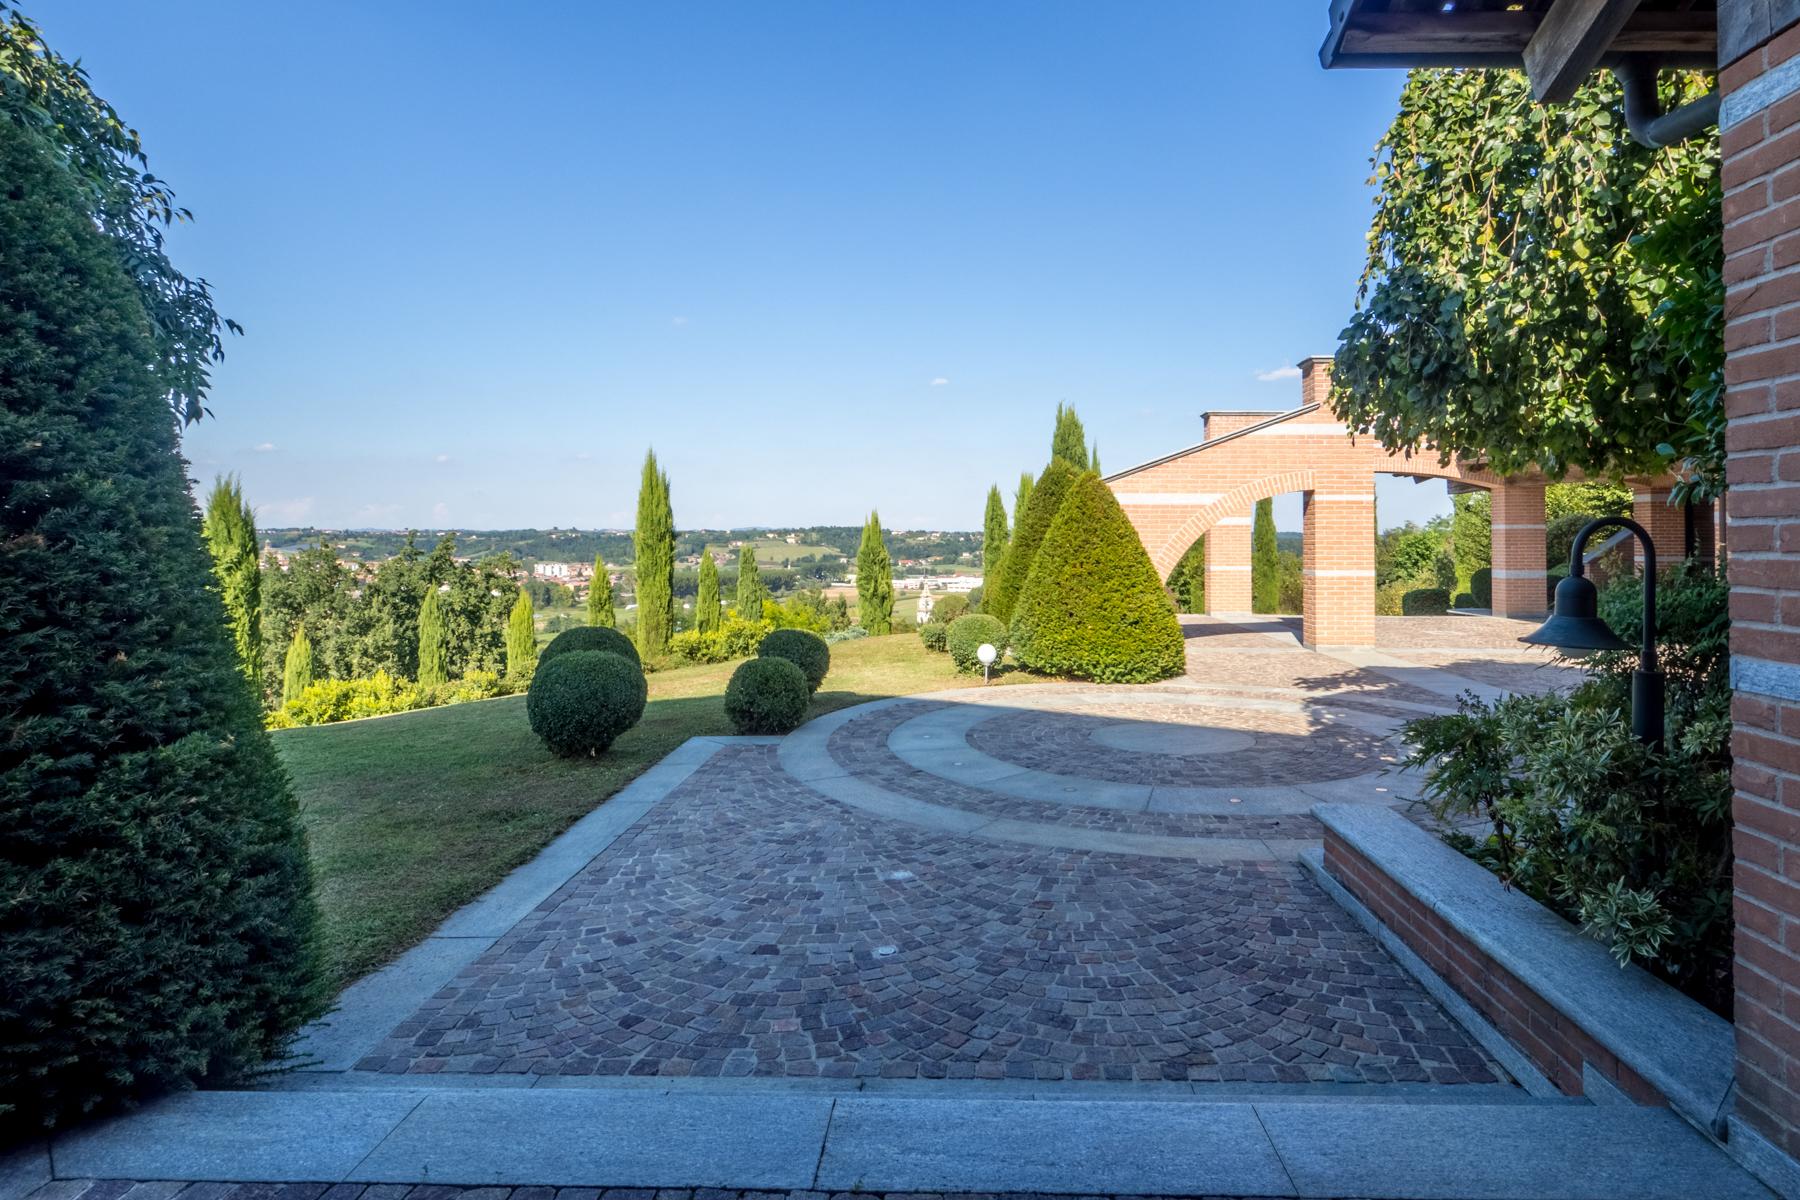 Villa in Vendita a Cantarana: 5 locali, 700 mq - Foto 21